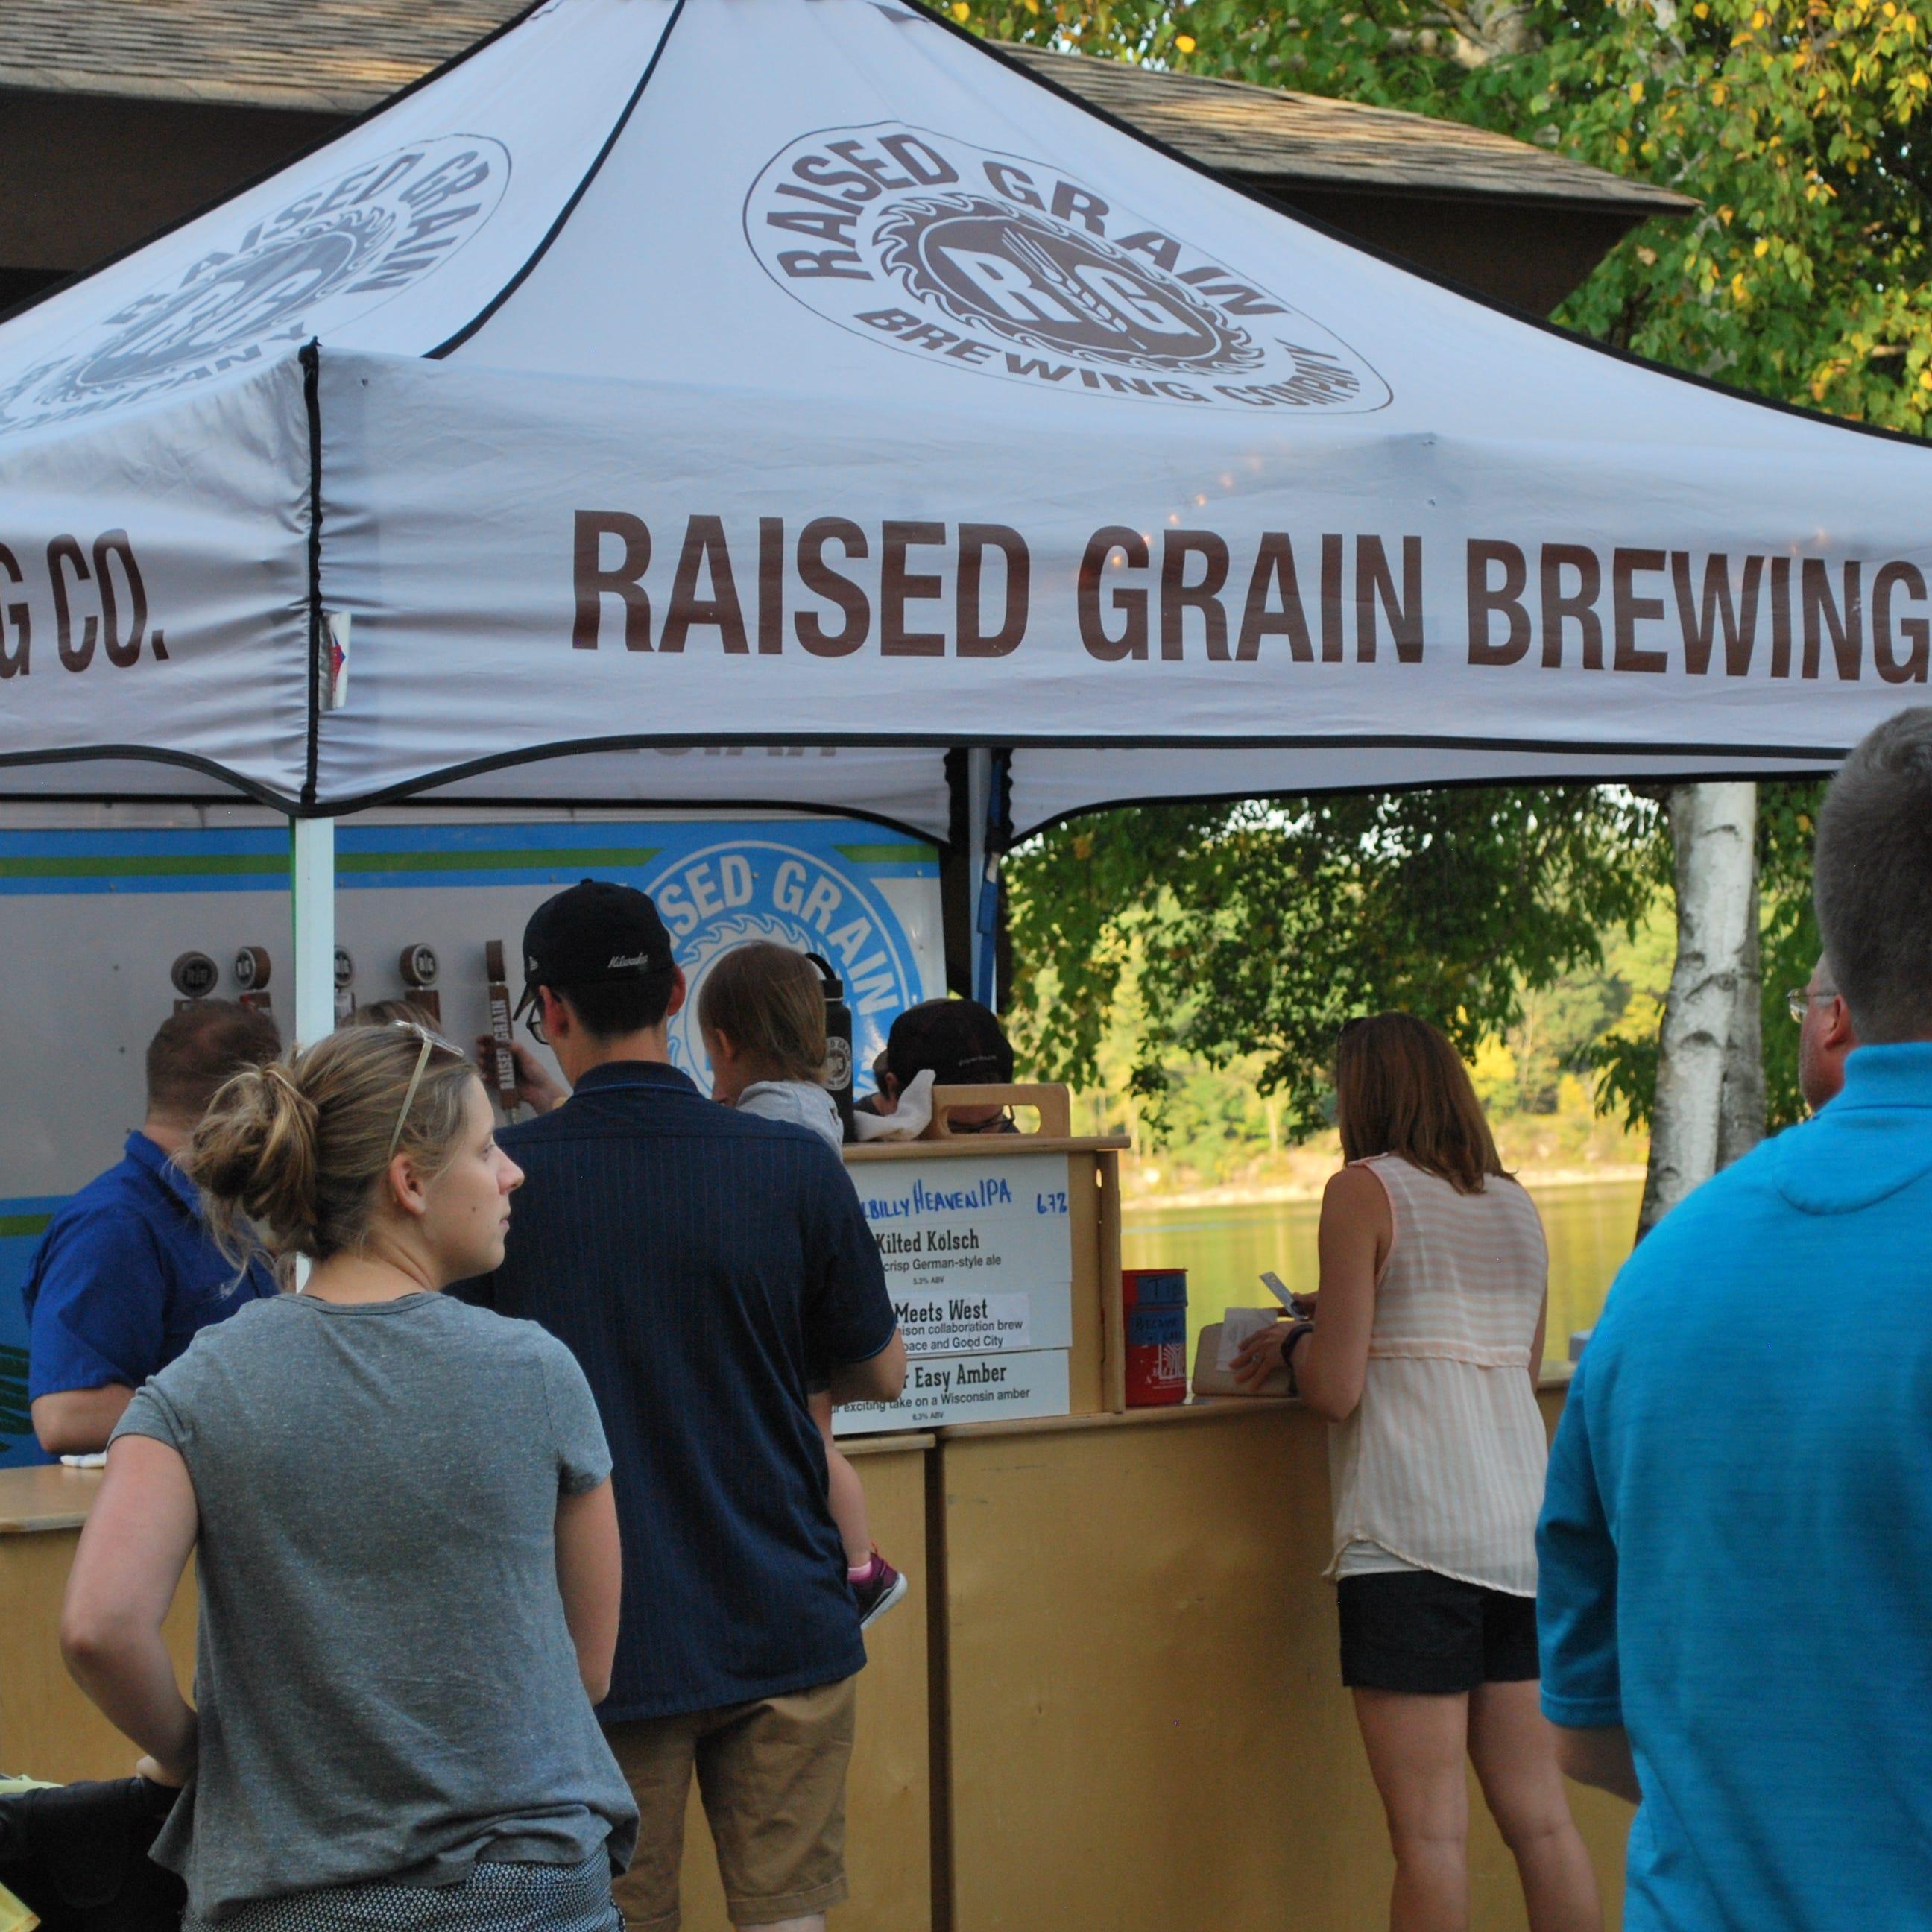 More traveling beer gardens: Black Husky in Washington County and Raised Grain in Waukesha County